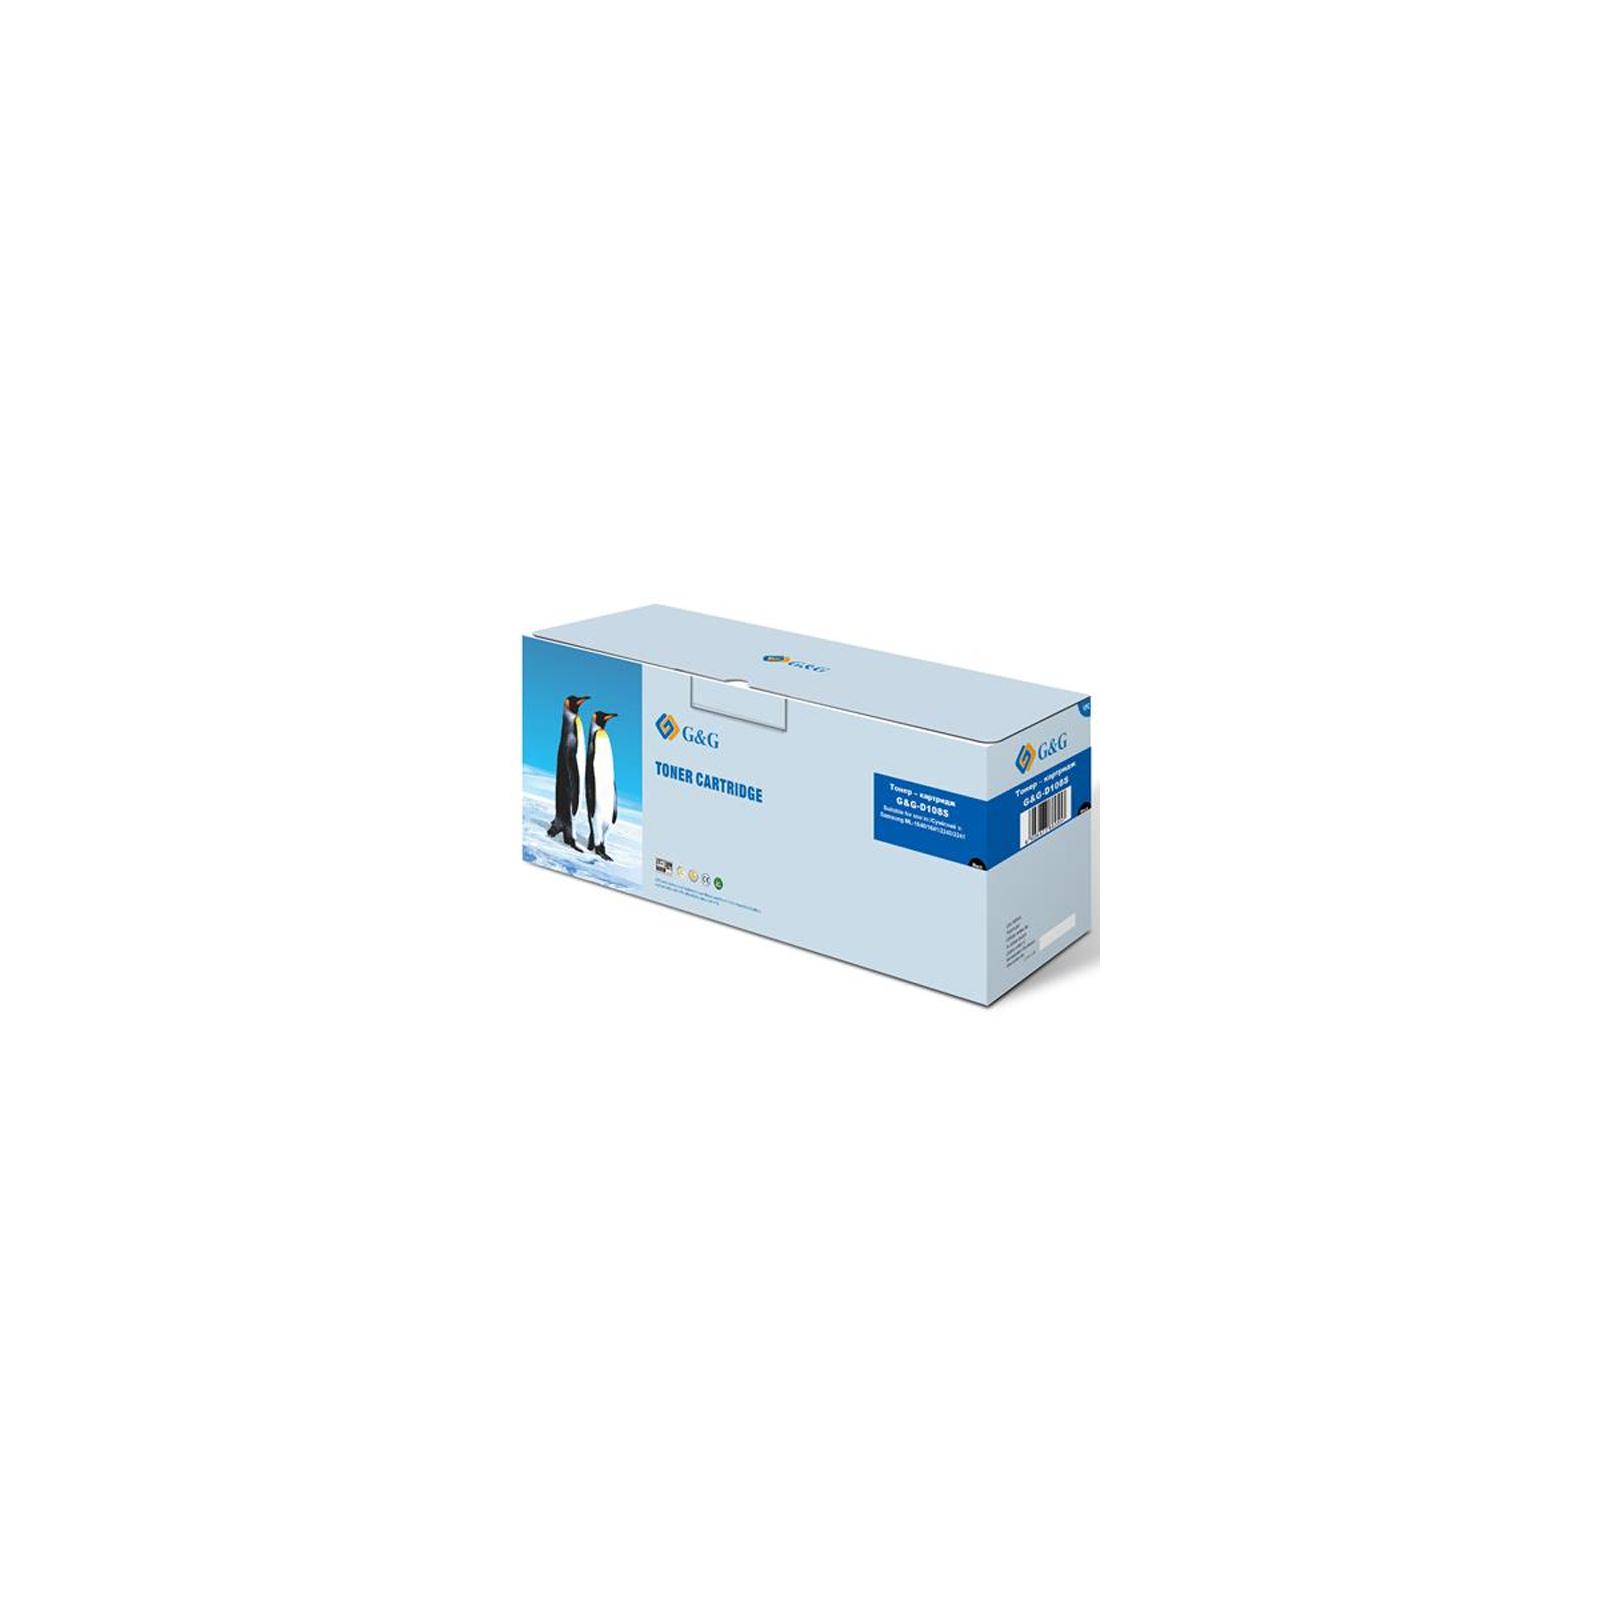 Картридж G&G для Samsung ML-1640/2240/2241/1641/ 1645 Black (G&G-D108S)